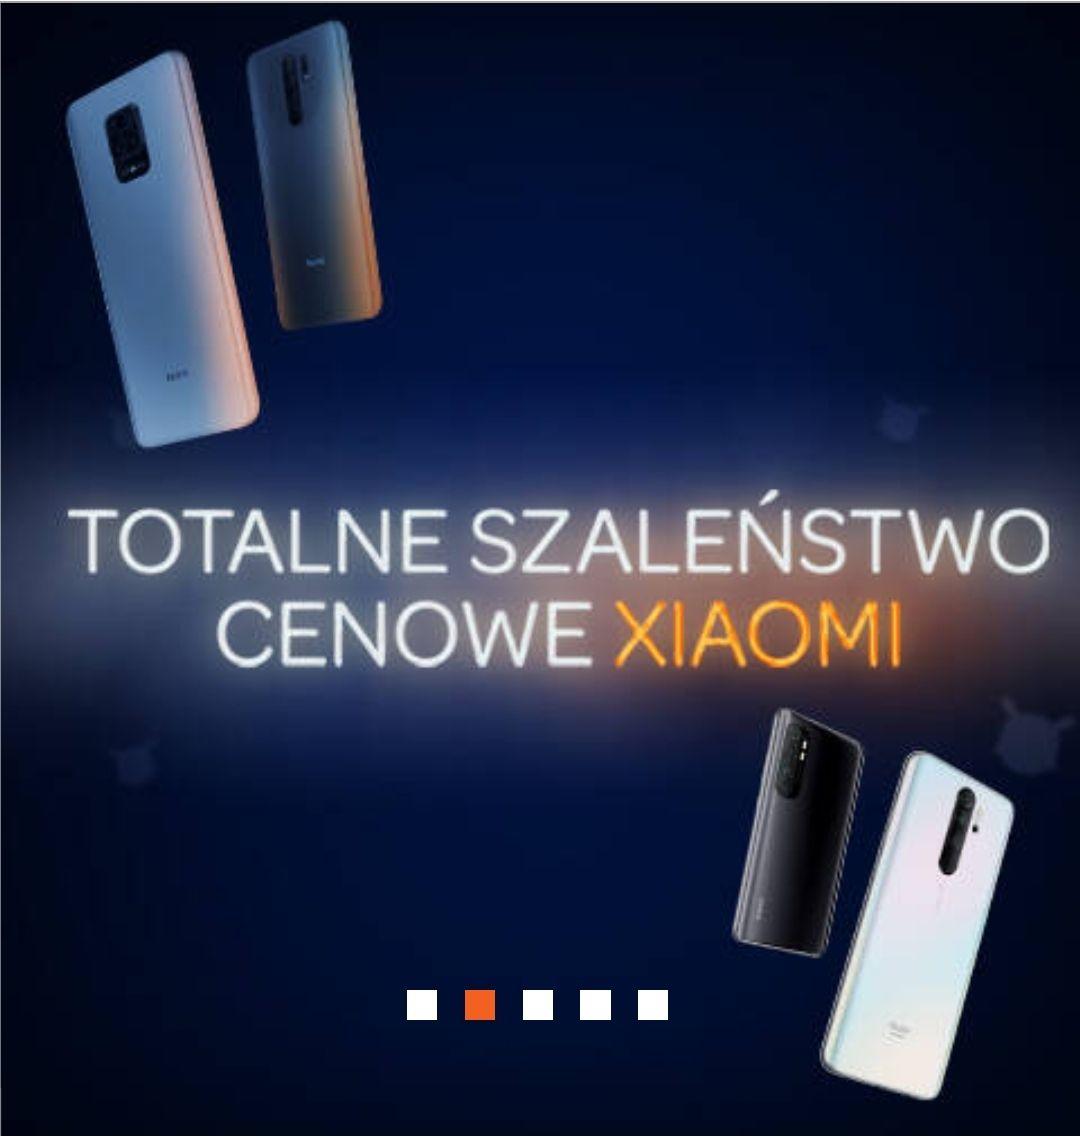 Promocje na Xiaomi Redmi 9, Redmi 9c, Redmi Note 8 Pro , Redmi Note 9, Redmi Note 9 Pro, Mi Note 10 Lite